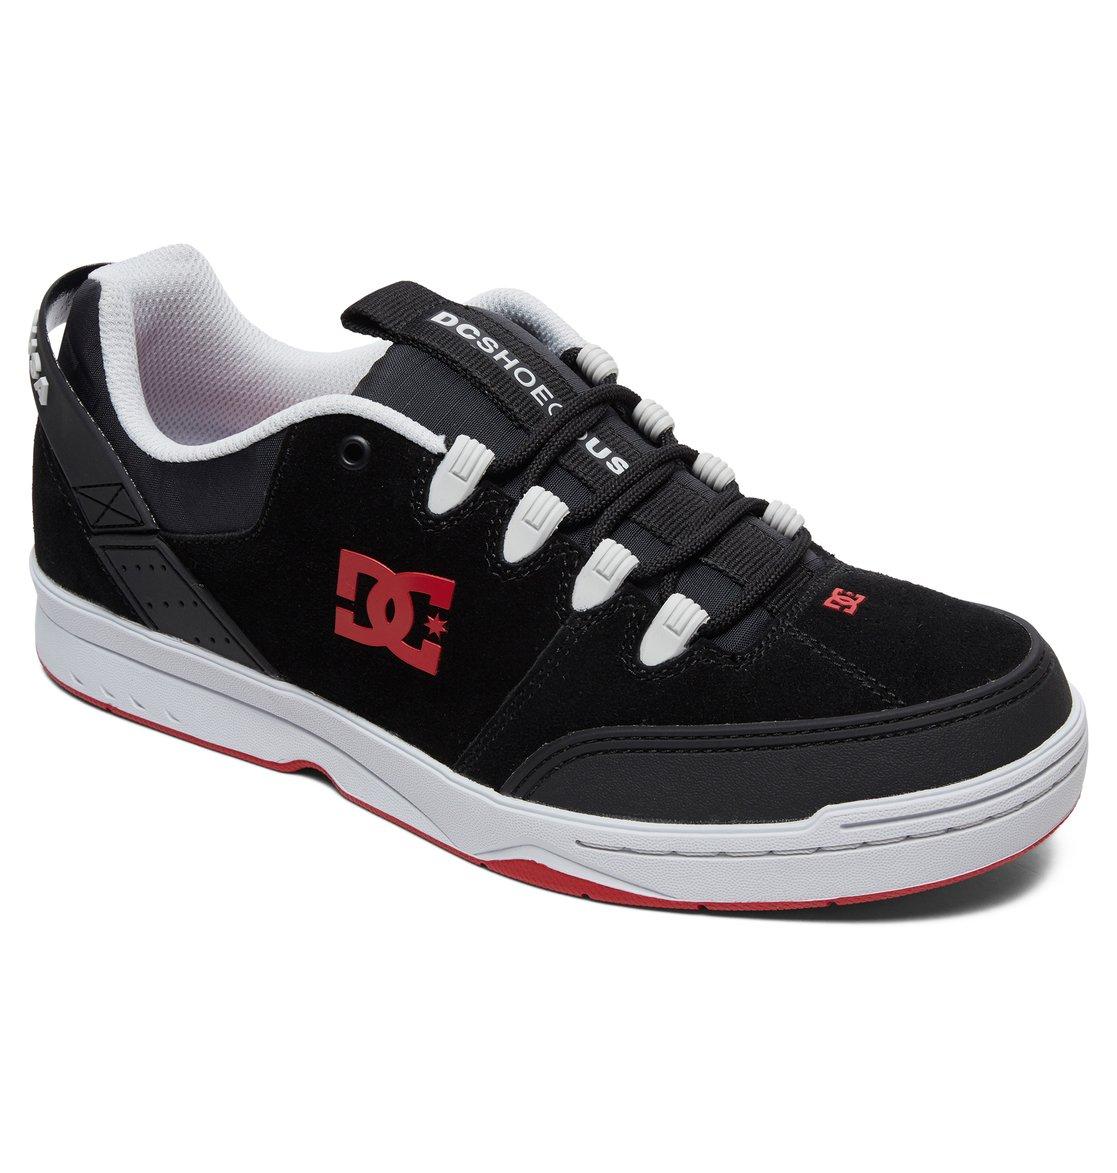 DC-Shoes-Syntax-Baskets-pour-Homme-ADYS300290 miniature 14